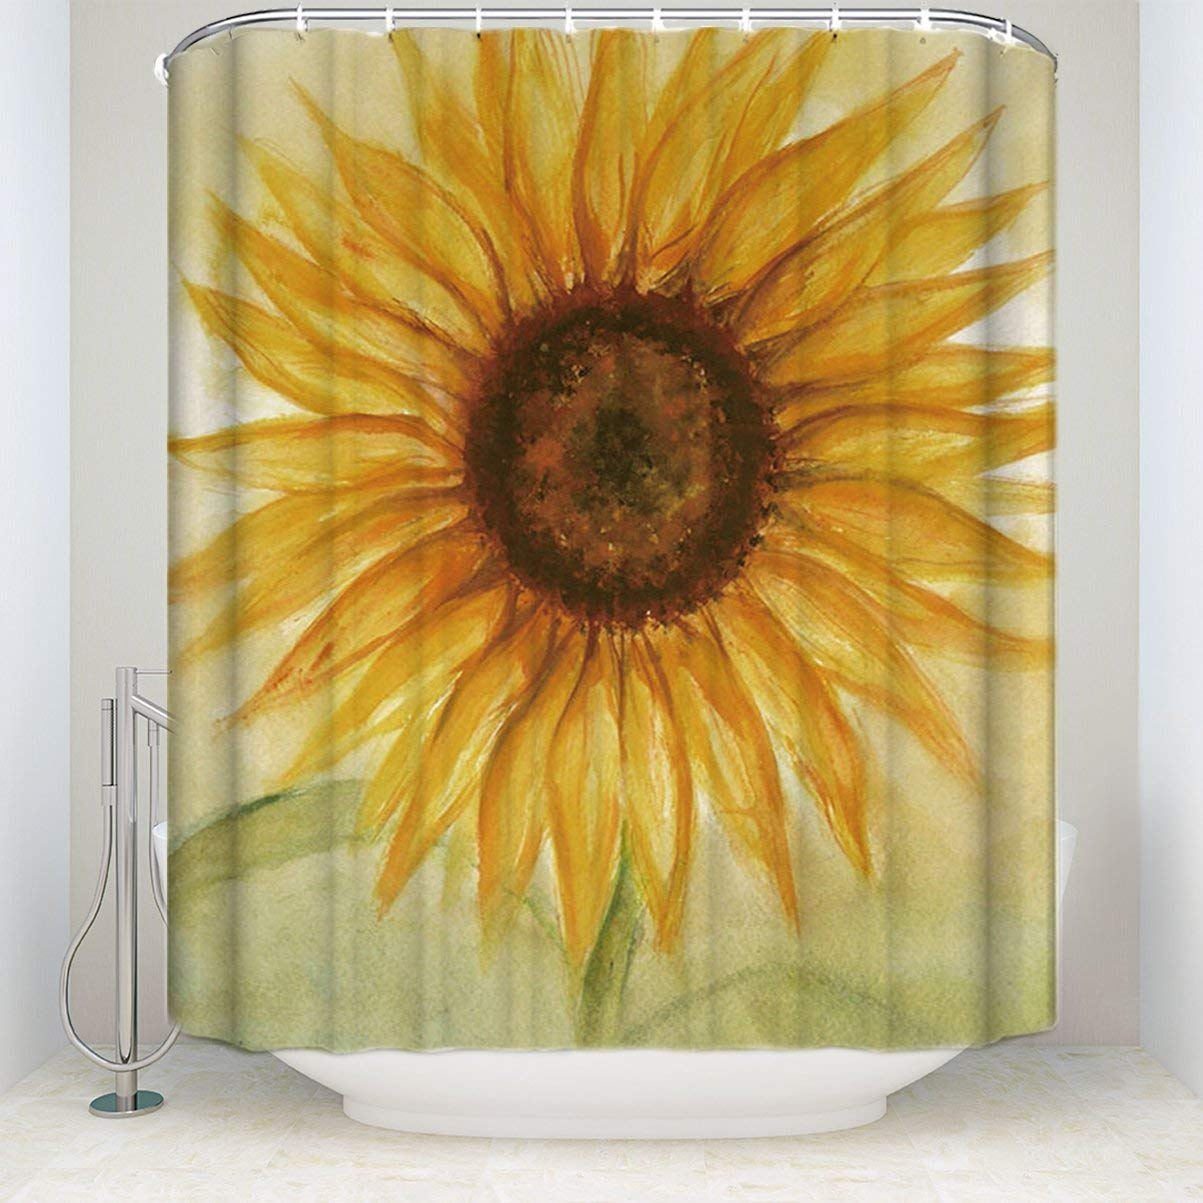 Big Sunflowers Pattern Shower Curtain Bathroom Decor